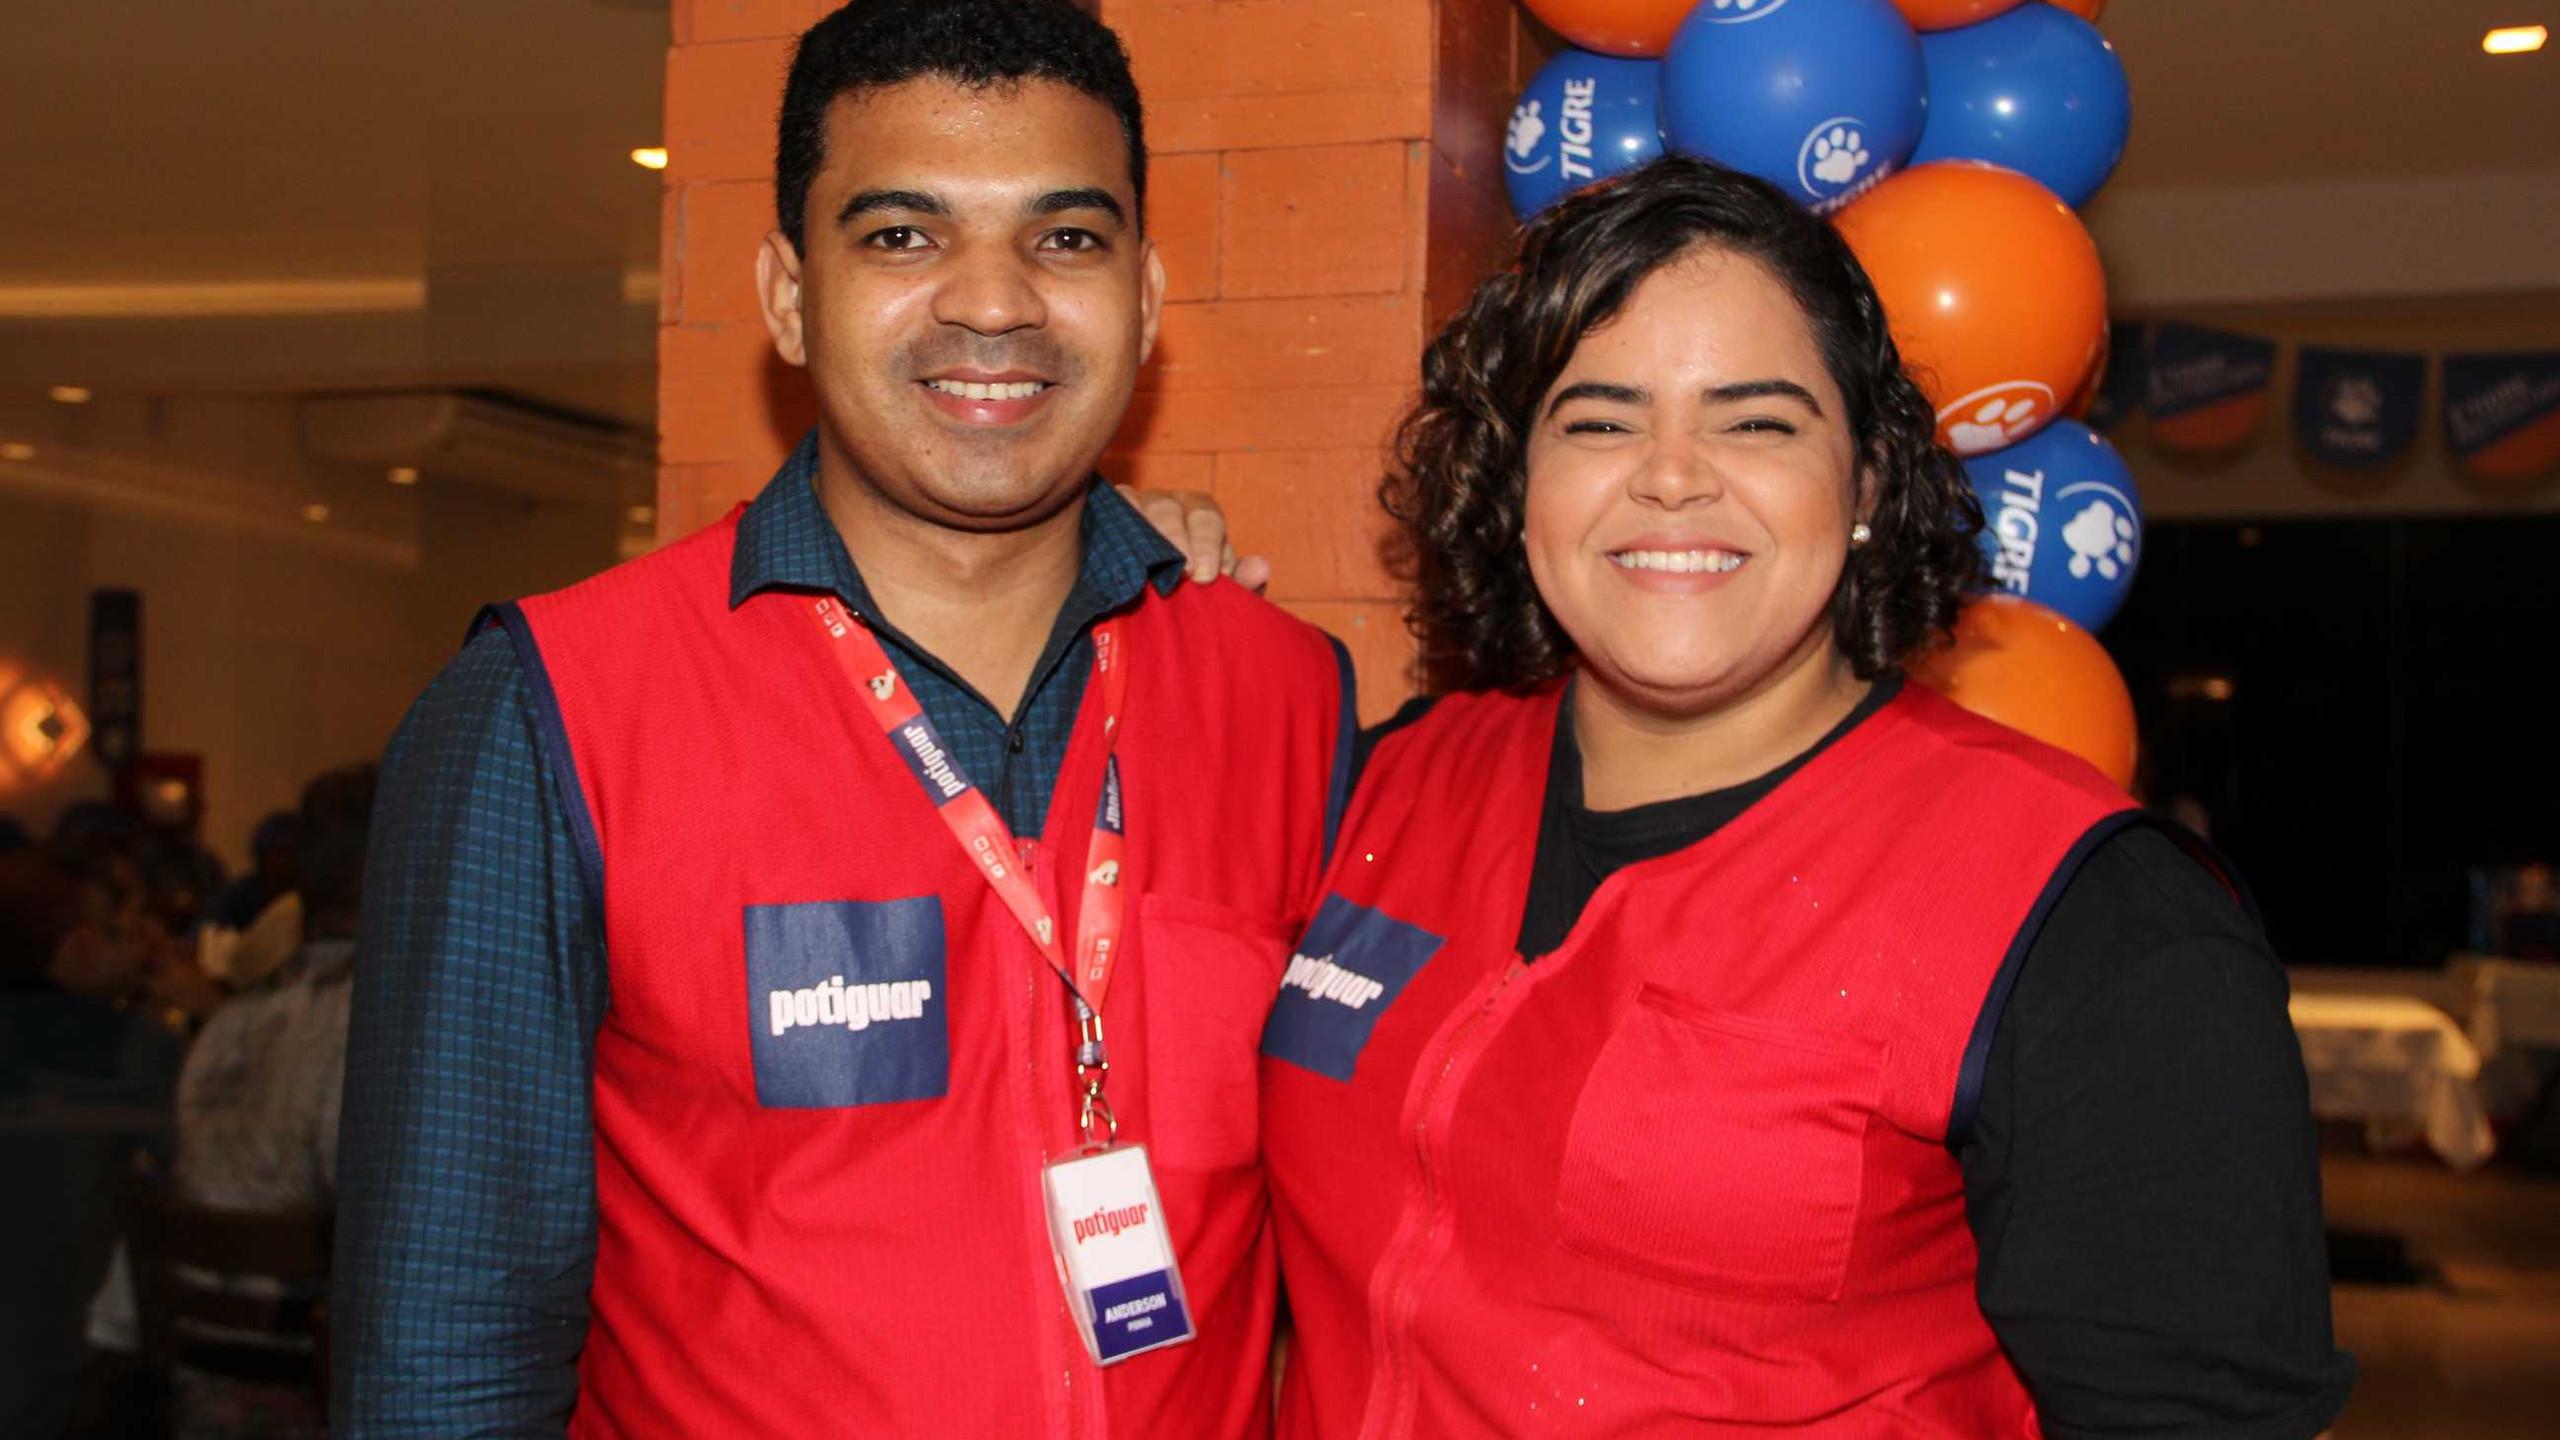 Anderson Penha e Thaylana Souza (Potiguar).